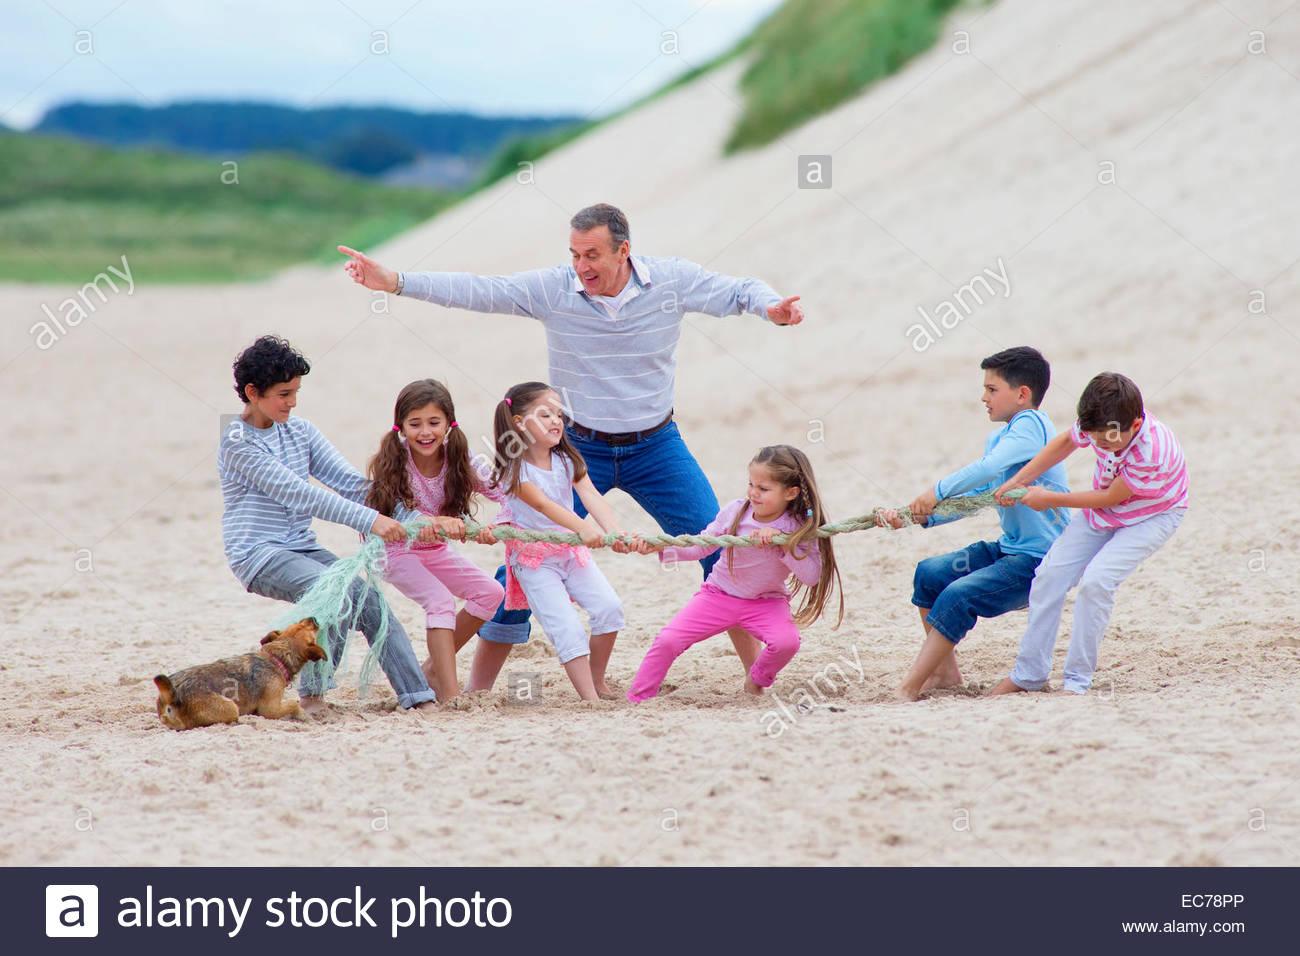 Grandfather supervising grandchildren playing tug-of-war on beach - Stock Image